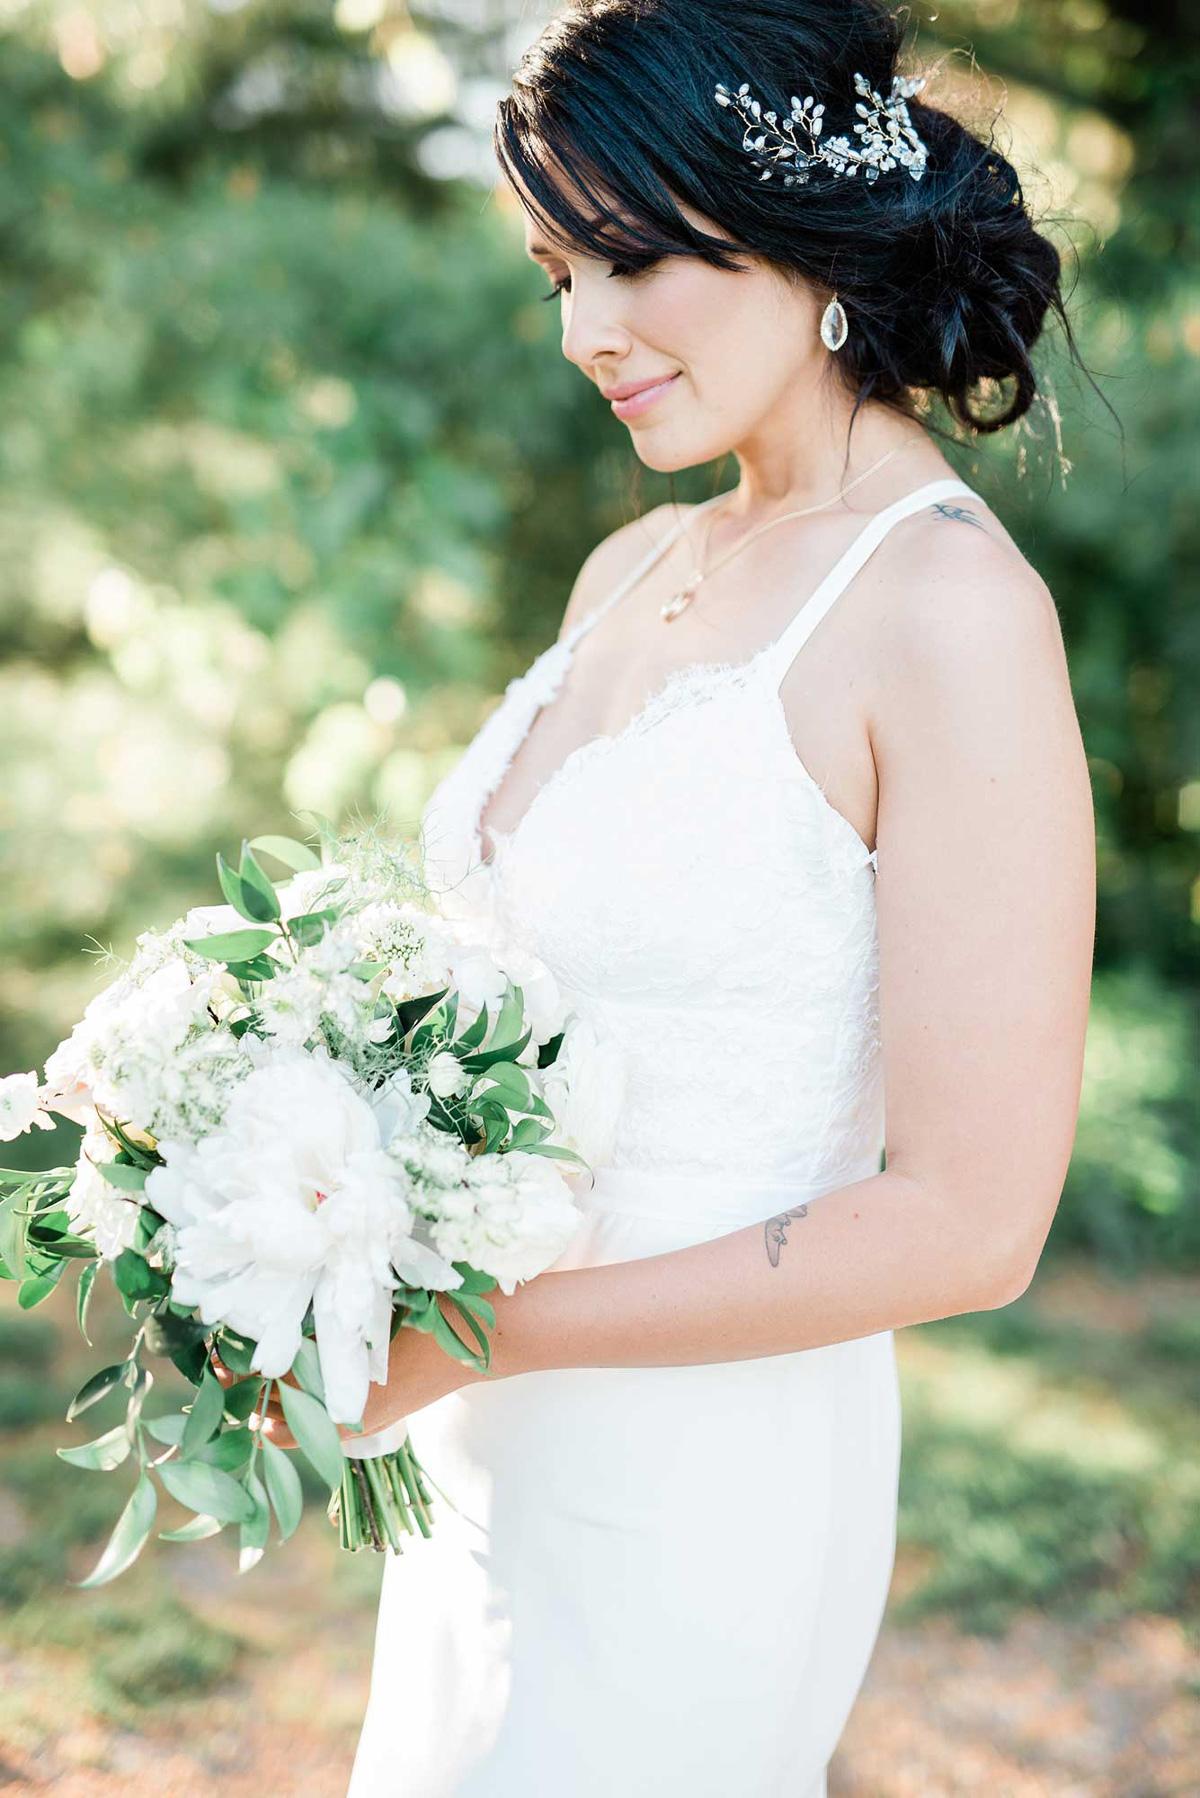 destiny-dawn-photography-vineyard-bride-swish-list-knollwood-golf-and-country-club-ancaster-wedding-editorial-28.jpg